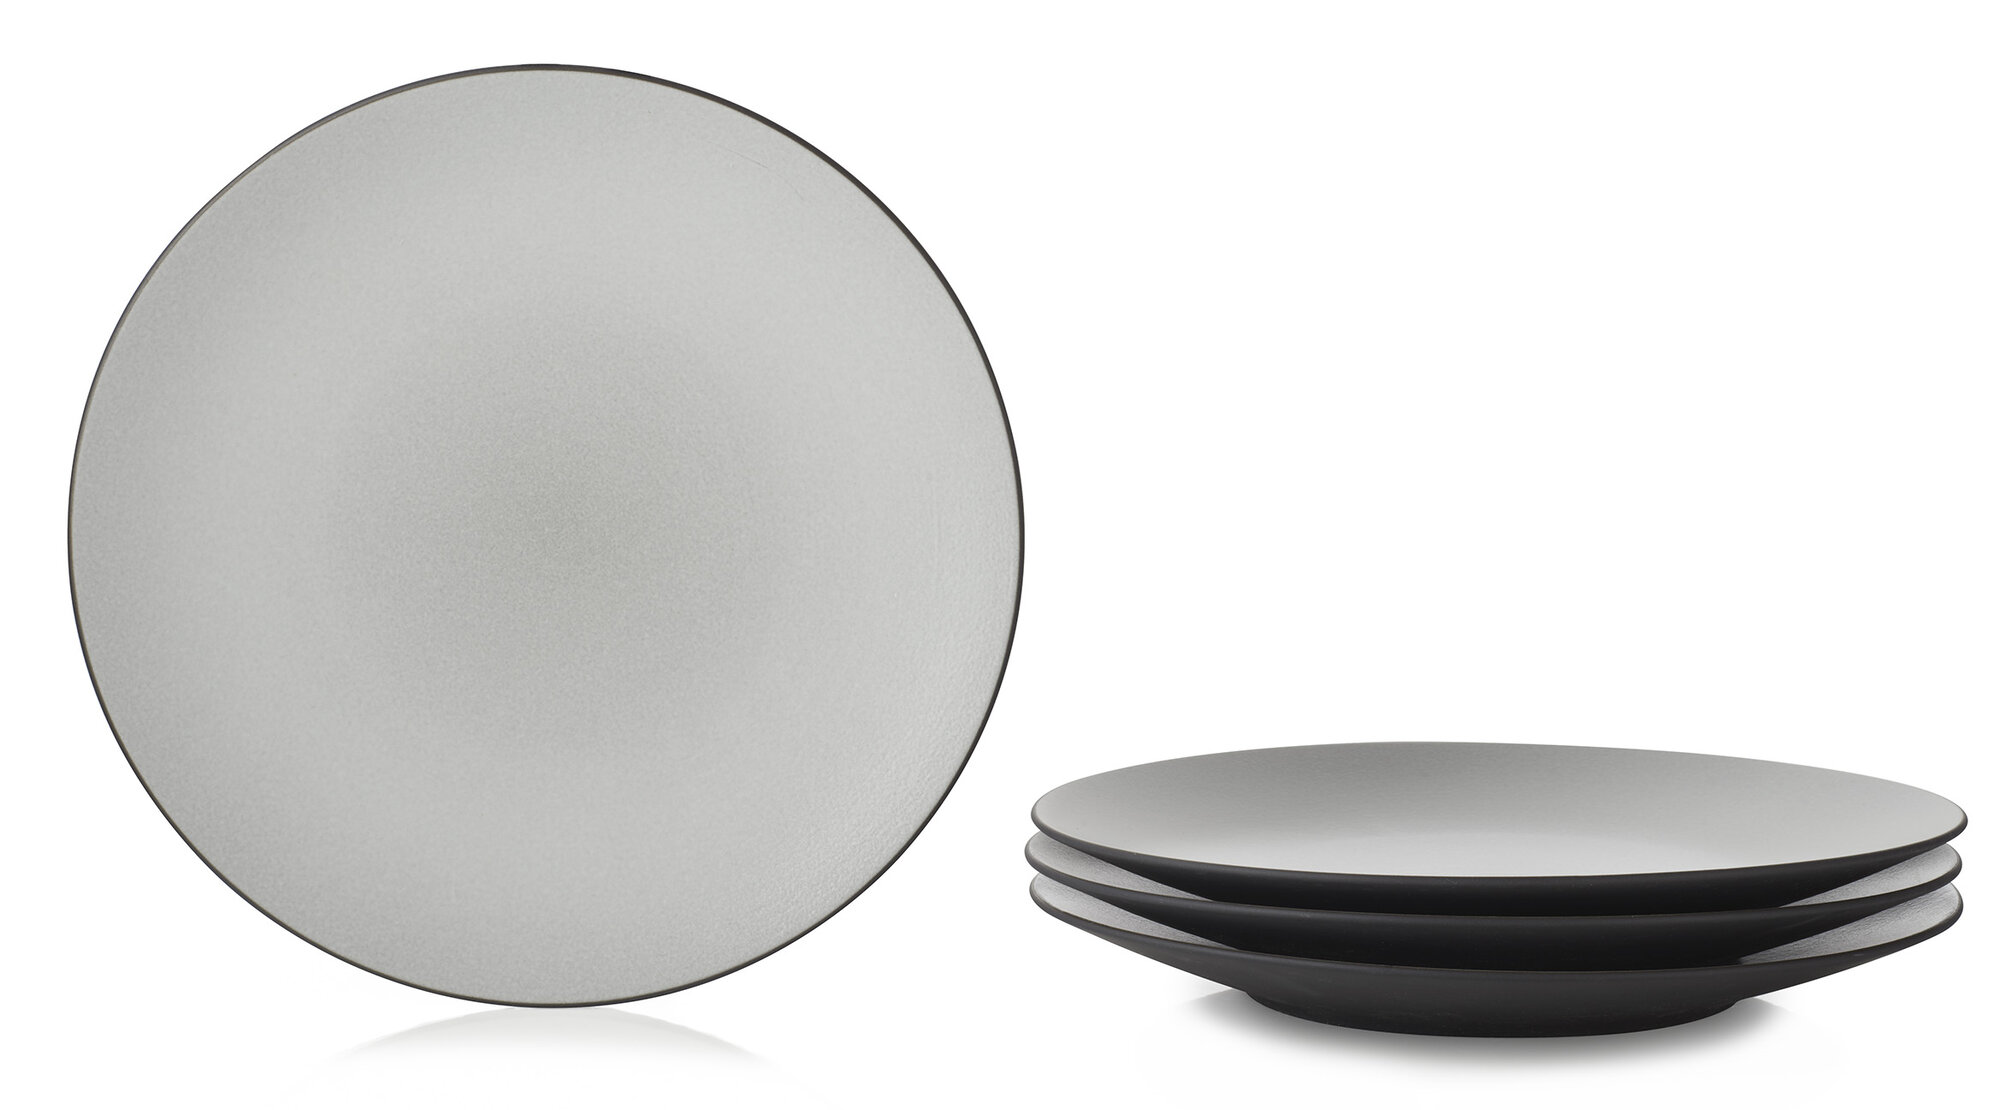 Revol Equinoxe 11 Dinner Plate Set Of 4 EBay